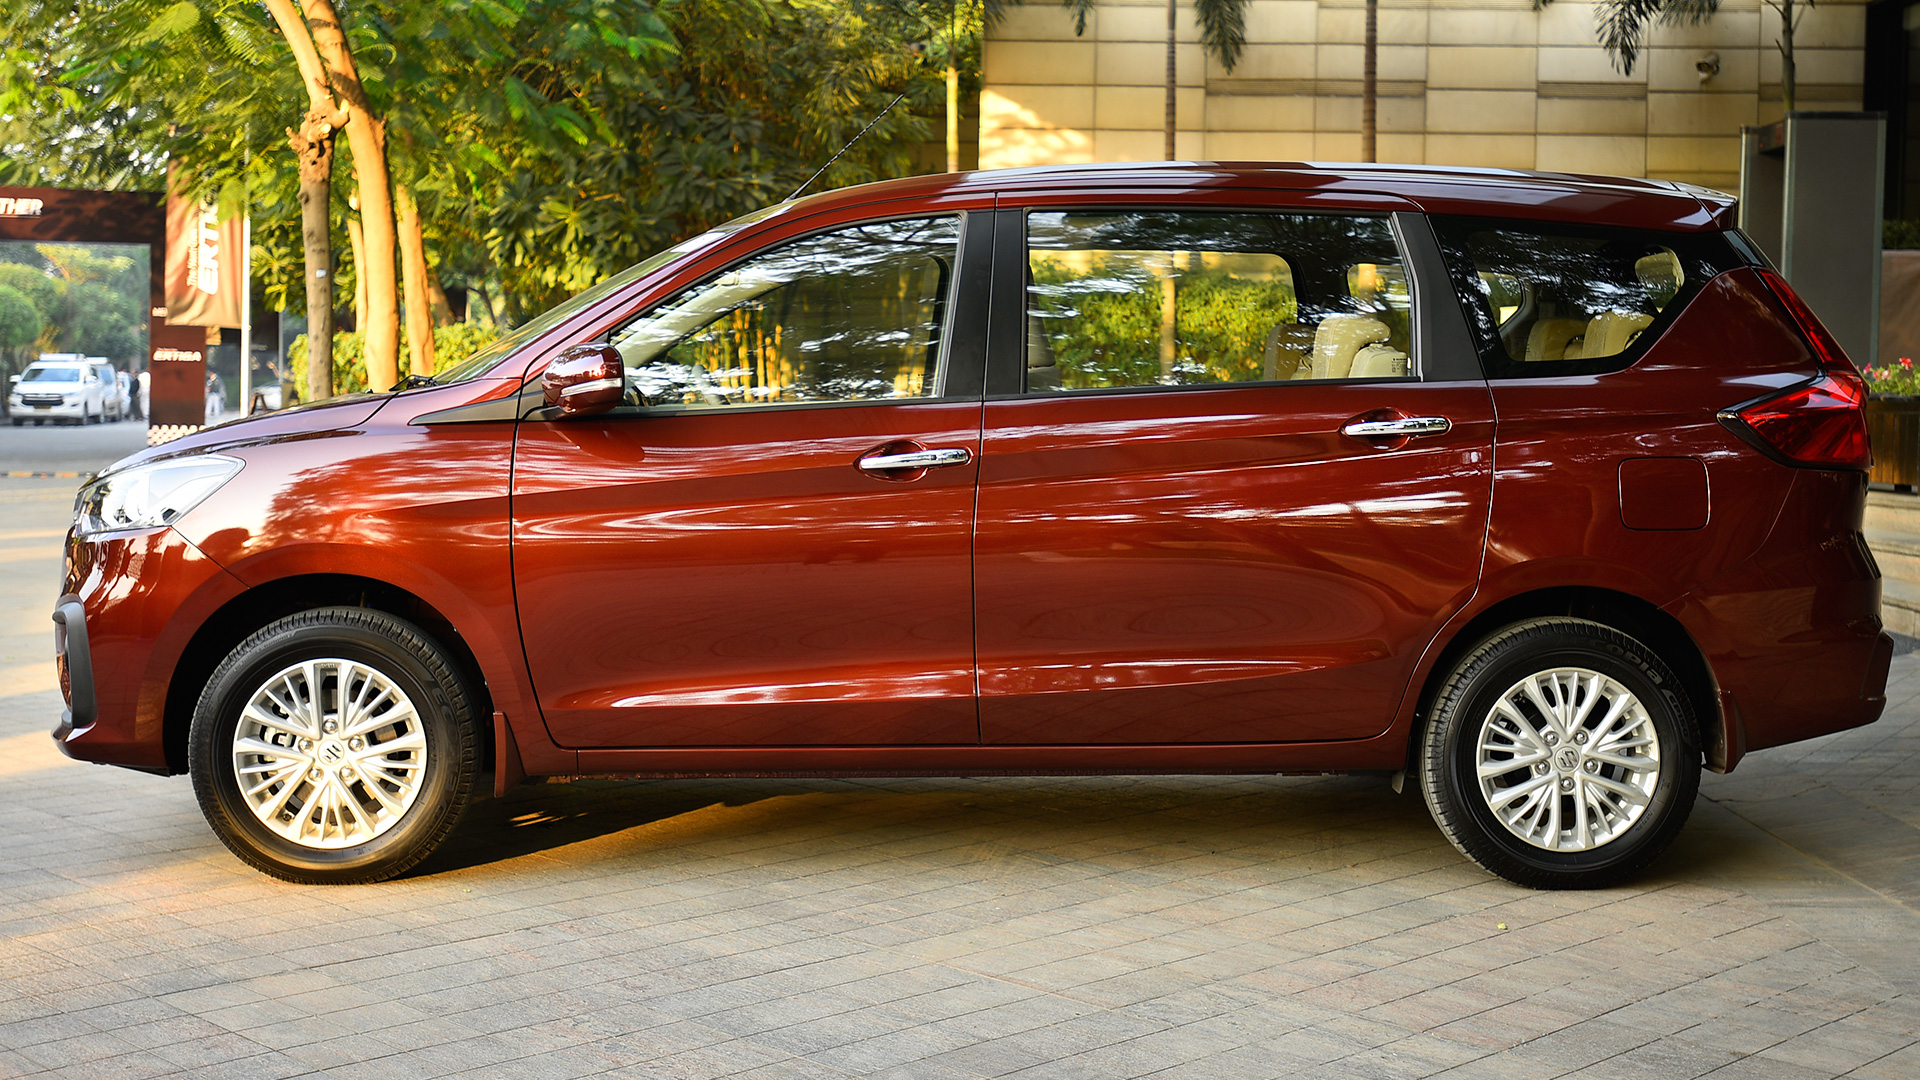 Maruti Suzuki Ertiga 2020 - Price, Mileage, Reviews, Specification ...